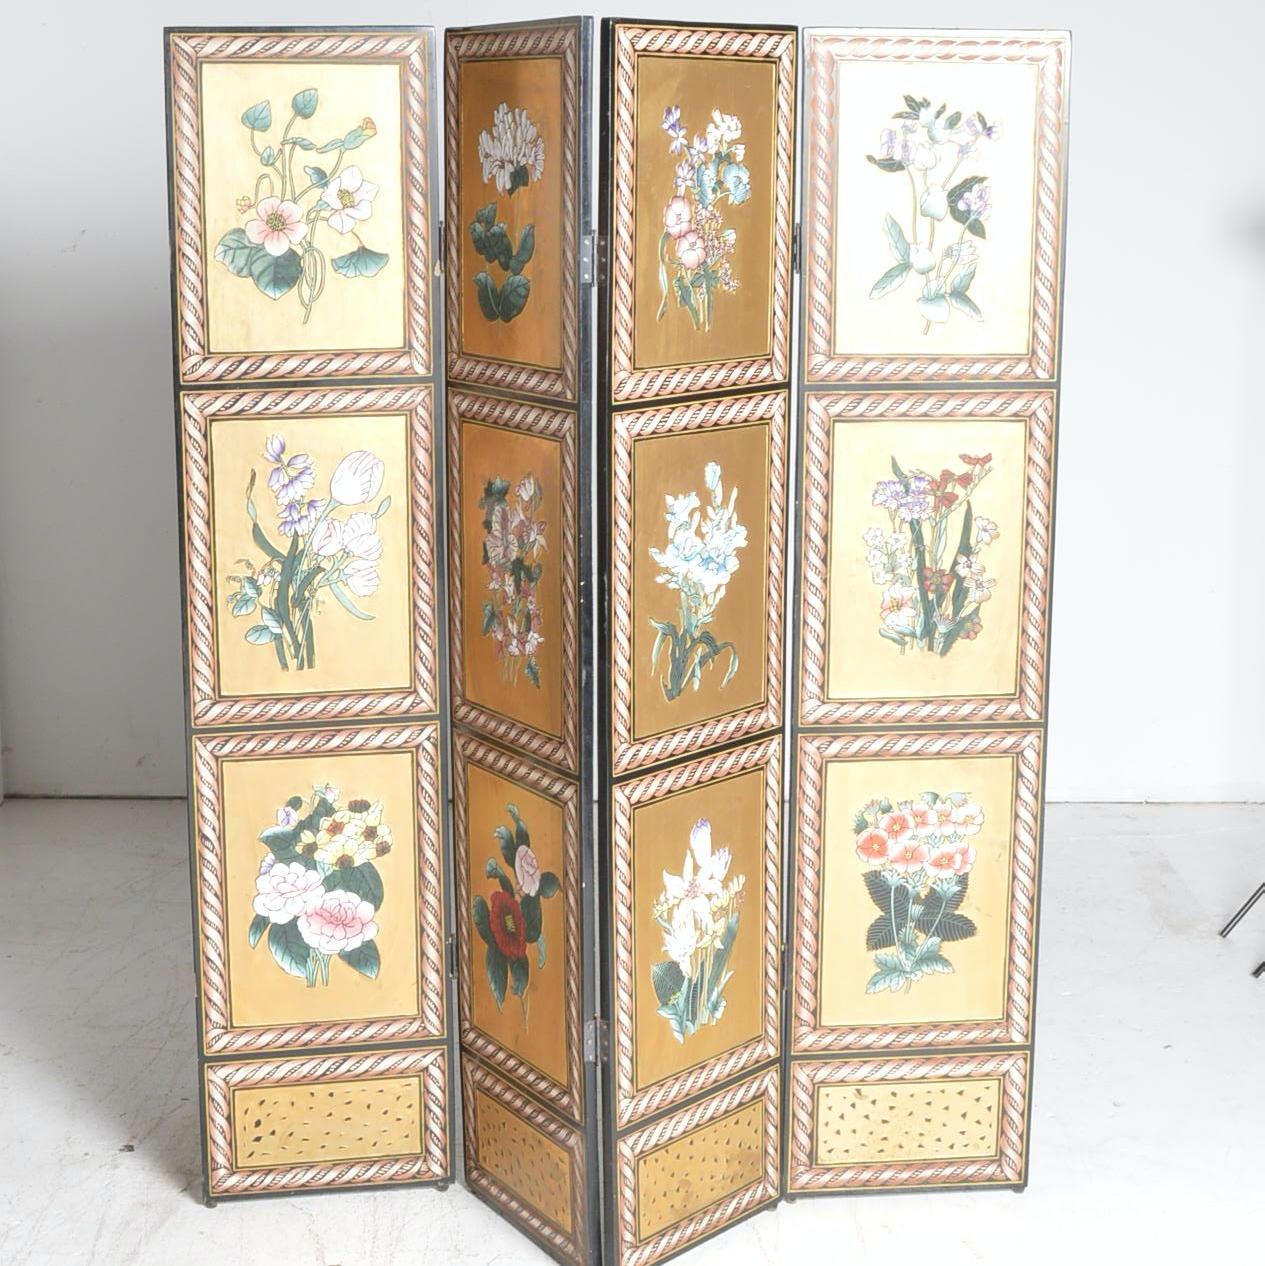 Floral Themed Room Divider